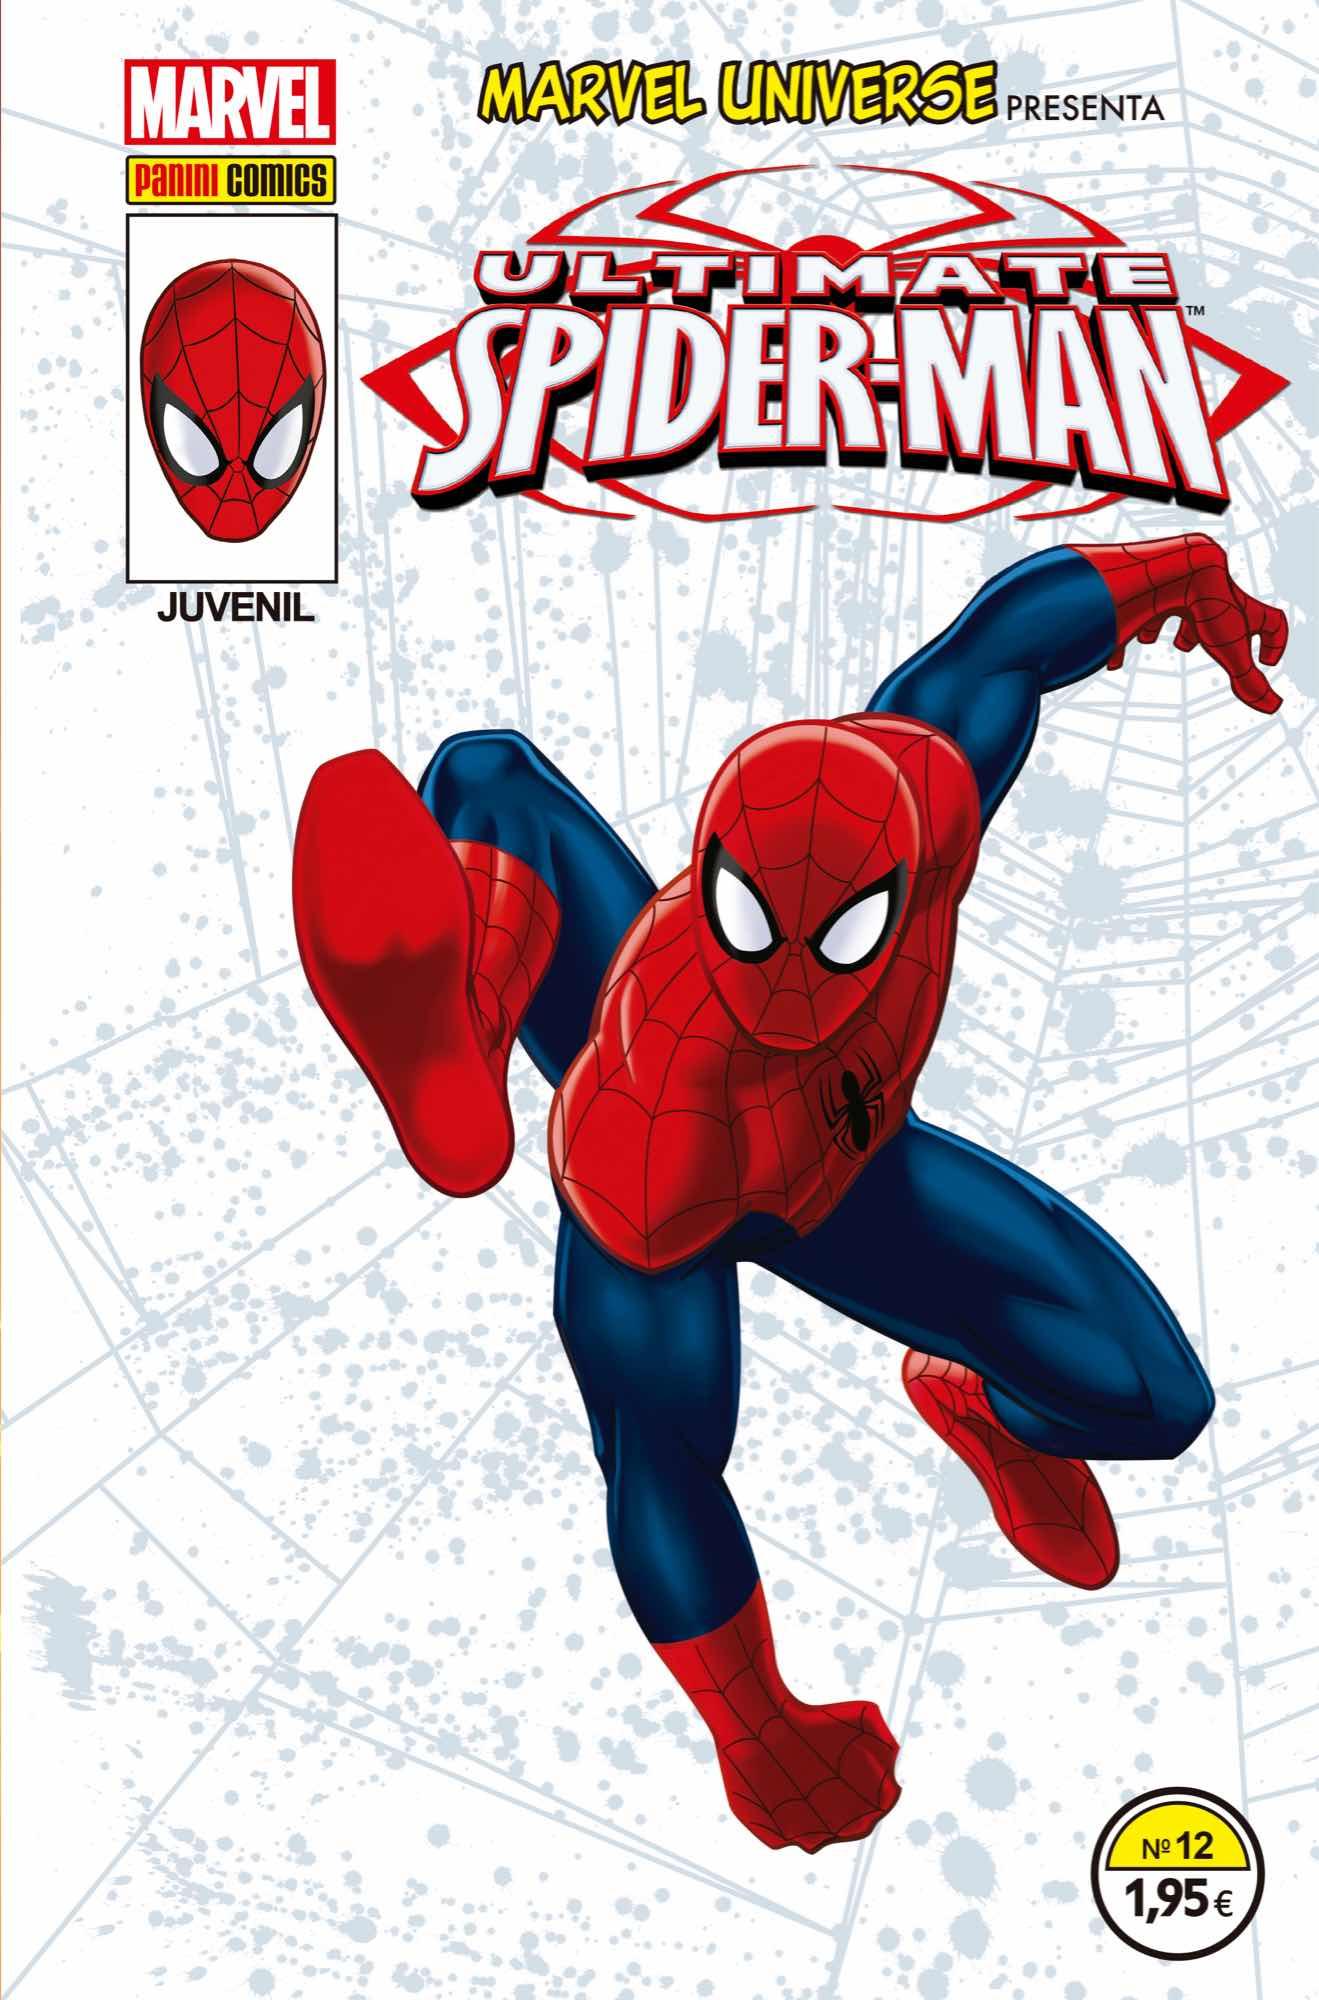 UNIVERSO MARVEL PRESENTA 12: ULTIMATE SPIDERMAN